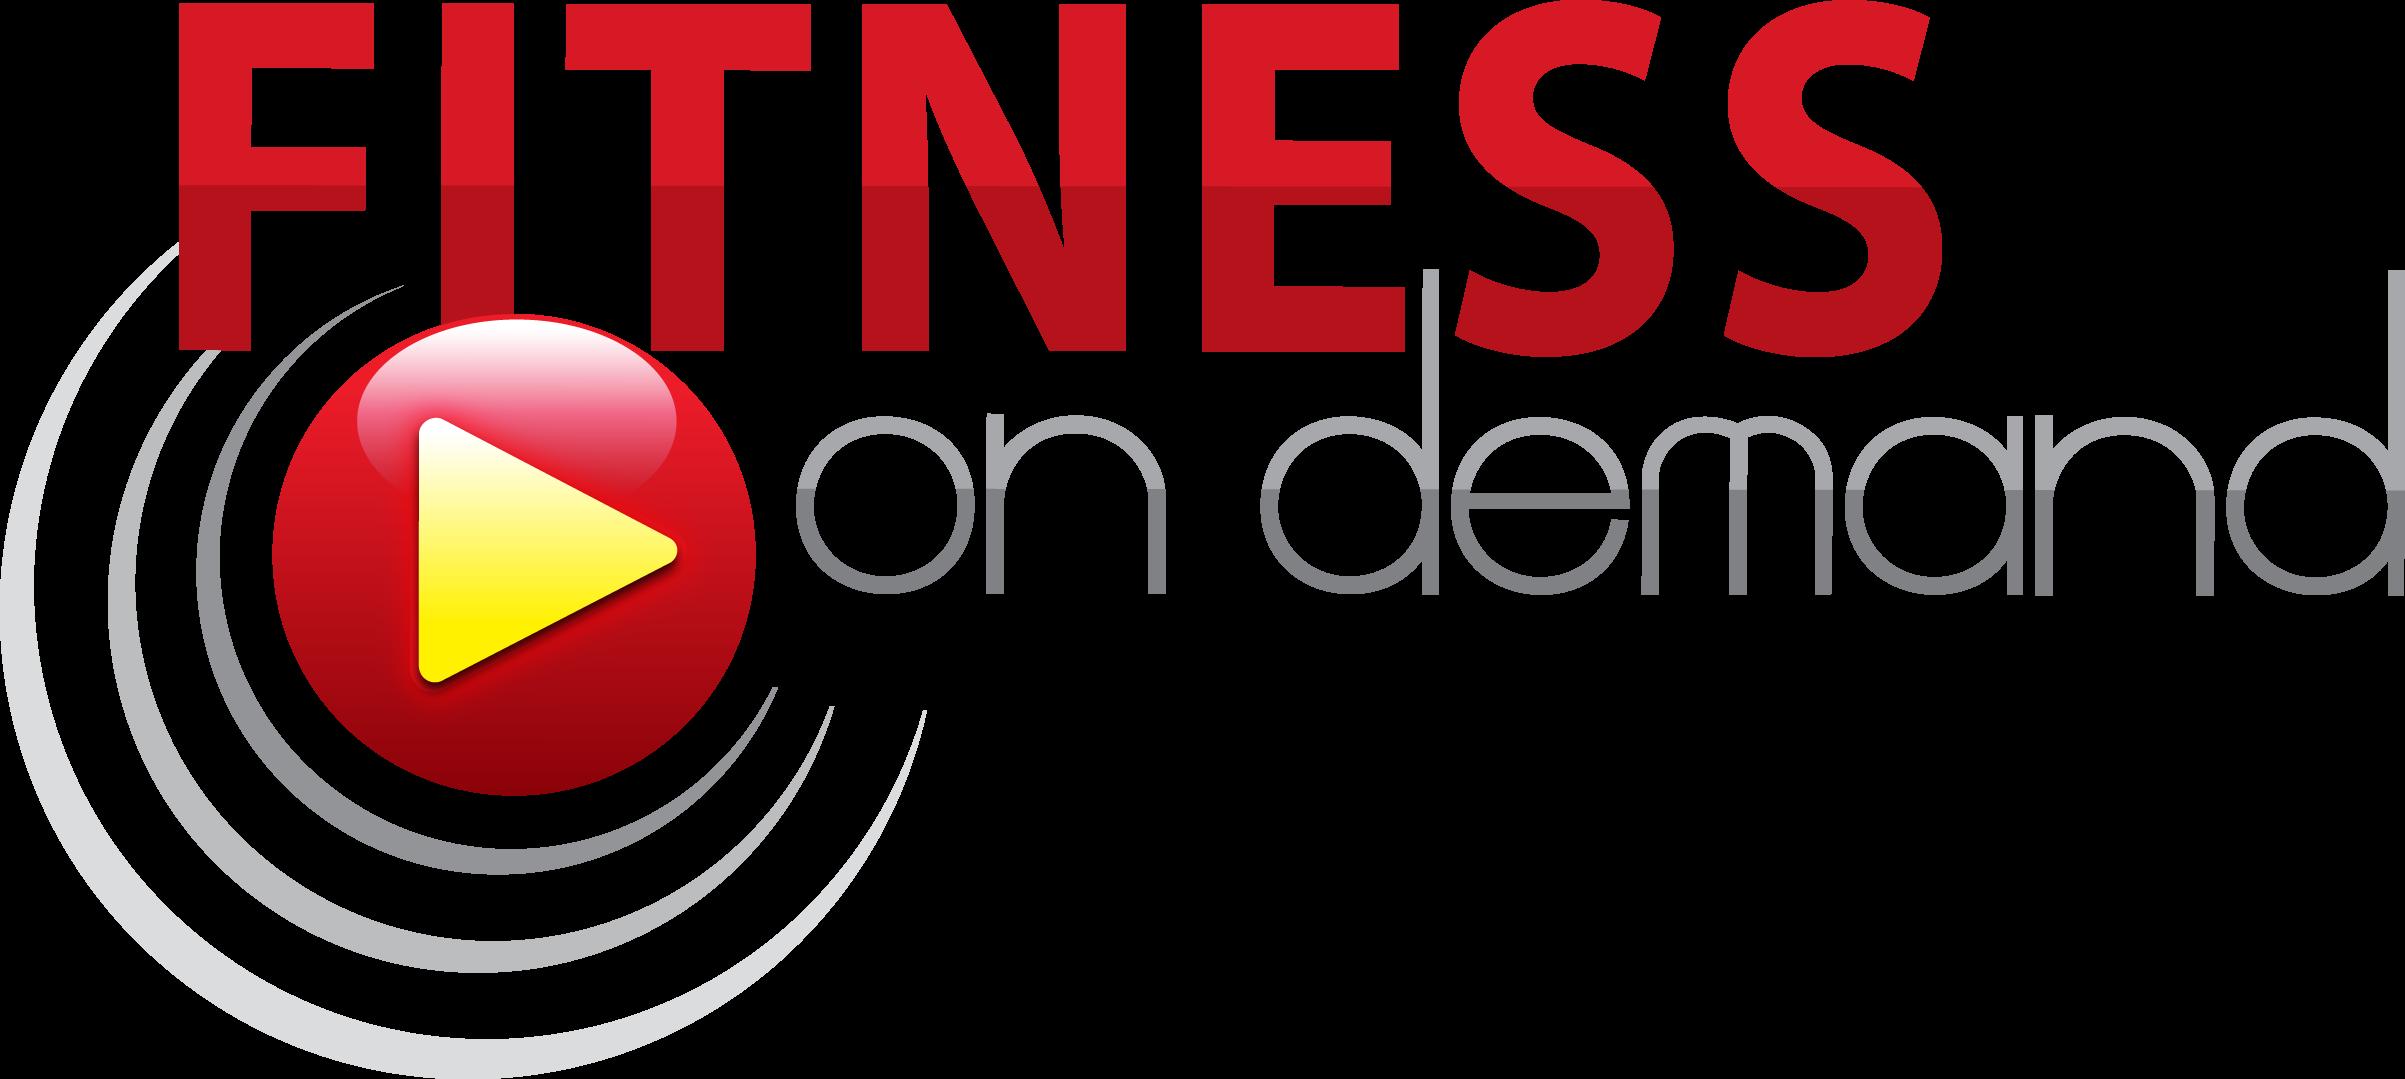 FitnessOnDemand.png